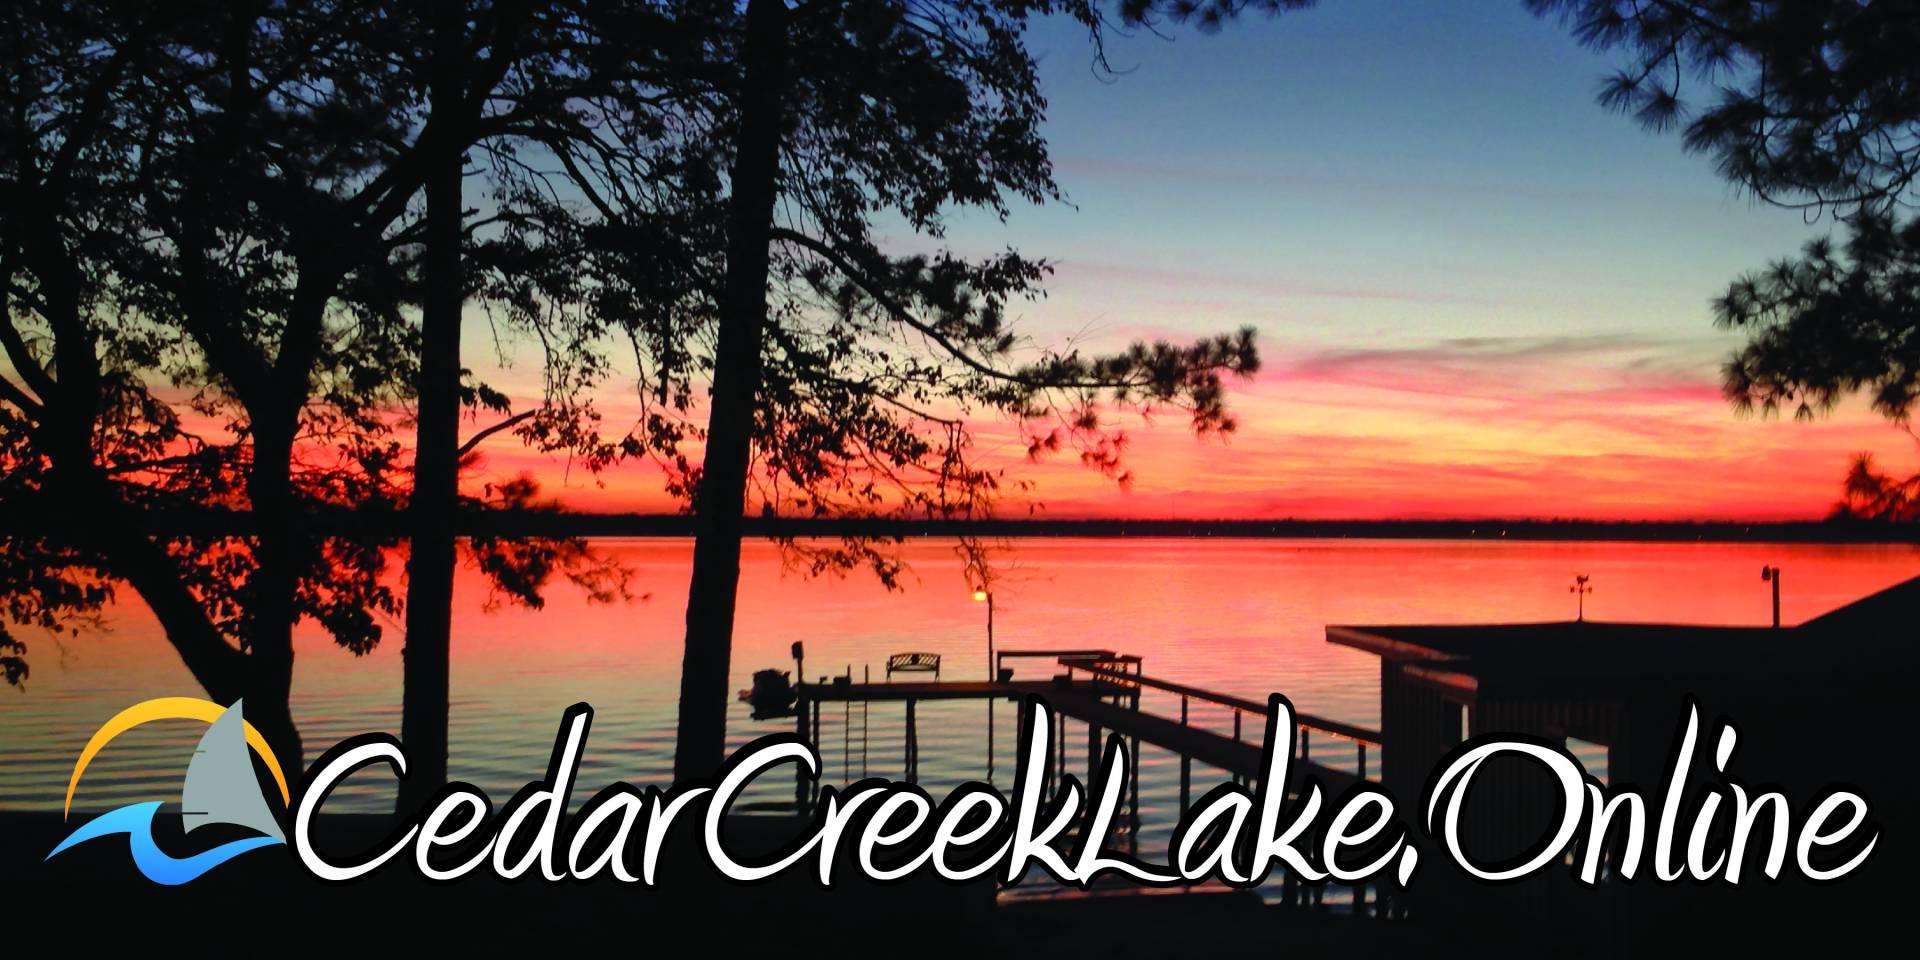 Cedar Creek Lake 2019 Top Highlights 1 CCLOL Logo w background 8 29 19 01 3 CedarCreekLake.Online